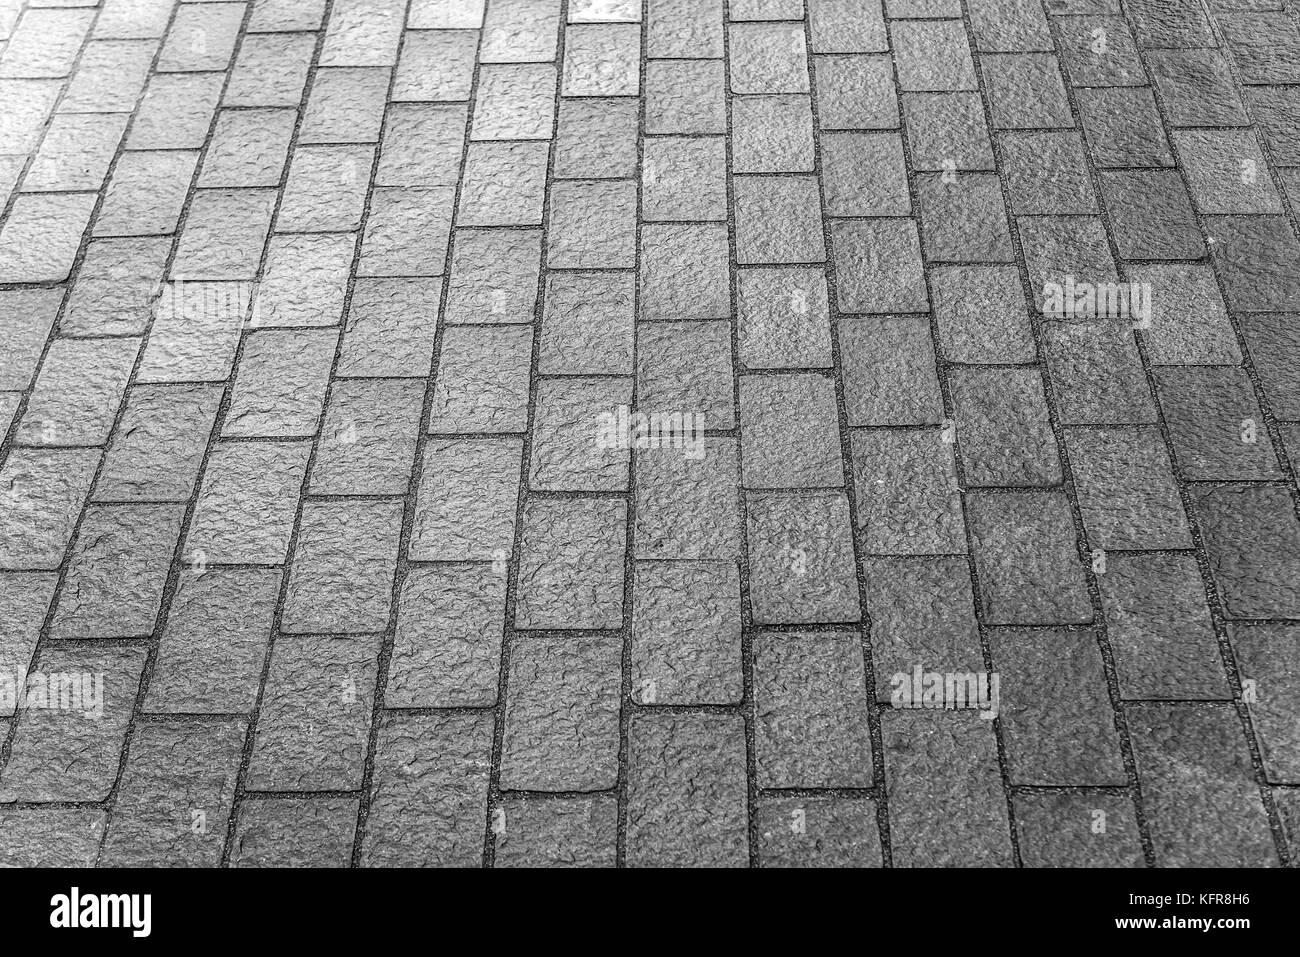 texture of the paving stone pavers stock photo 164624802 alamy